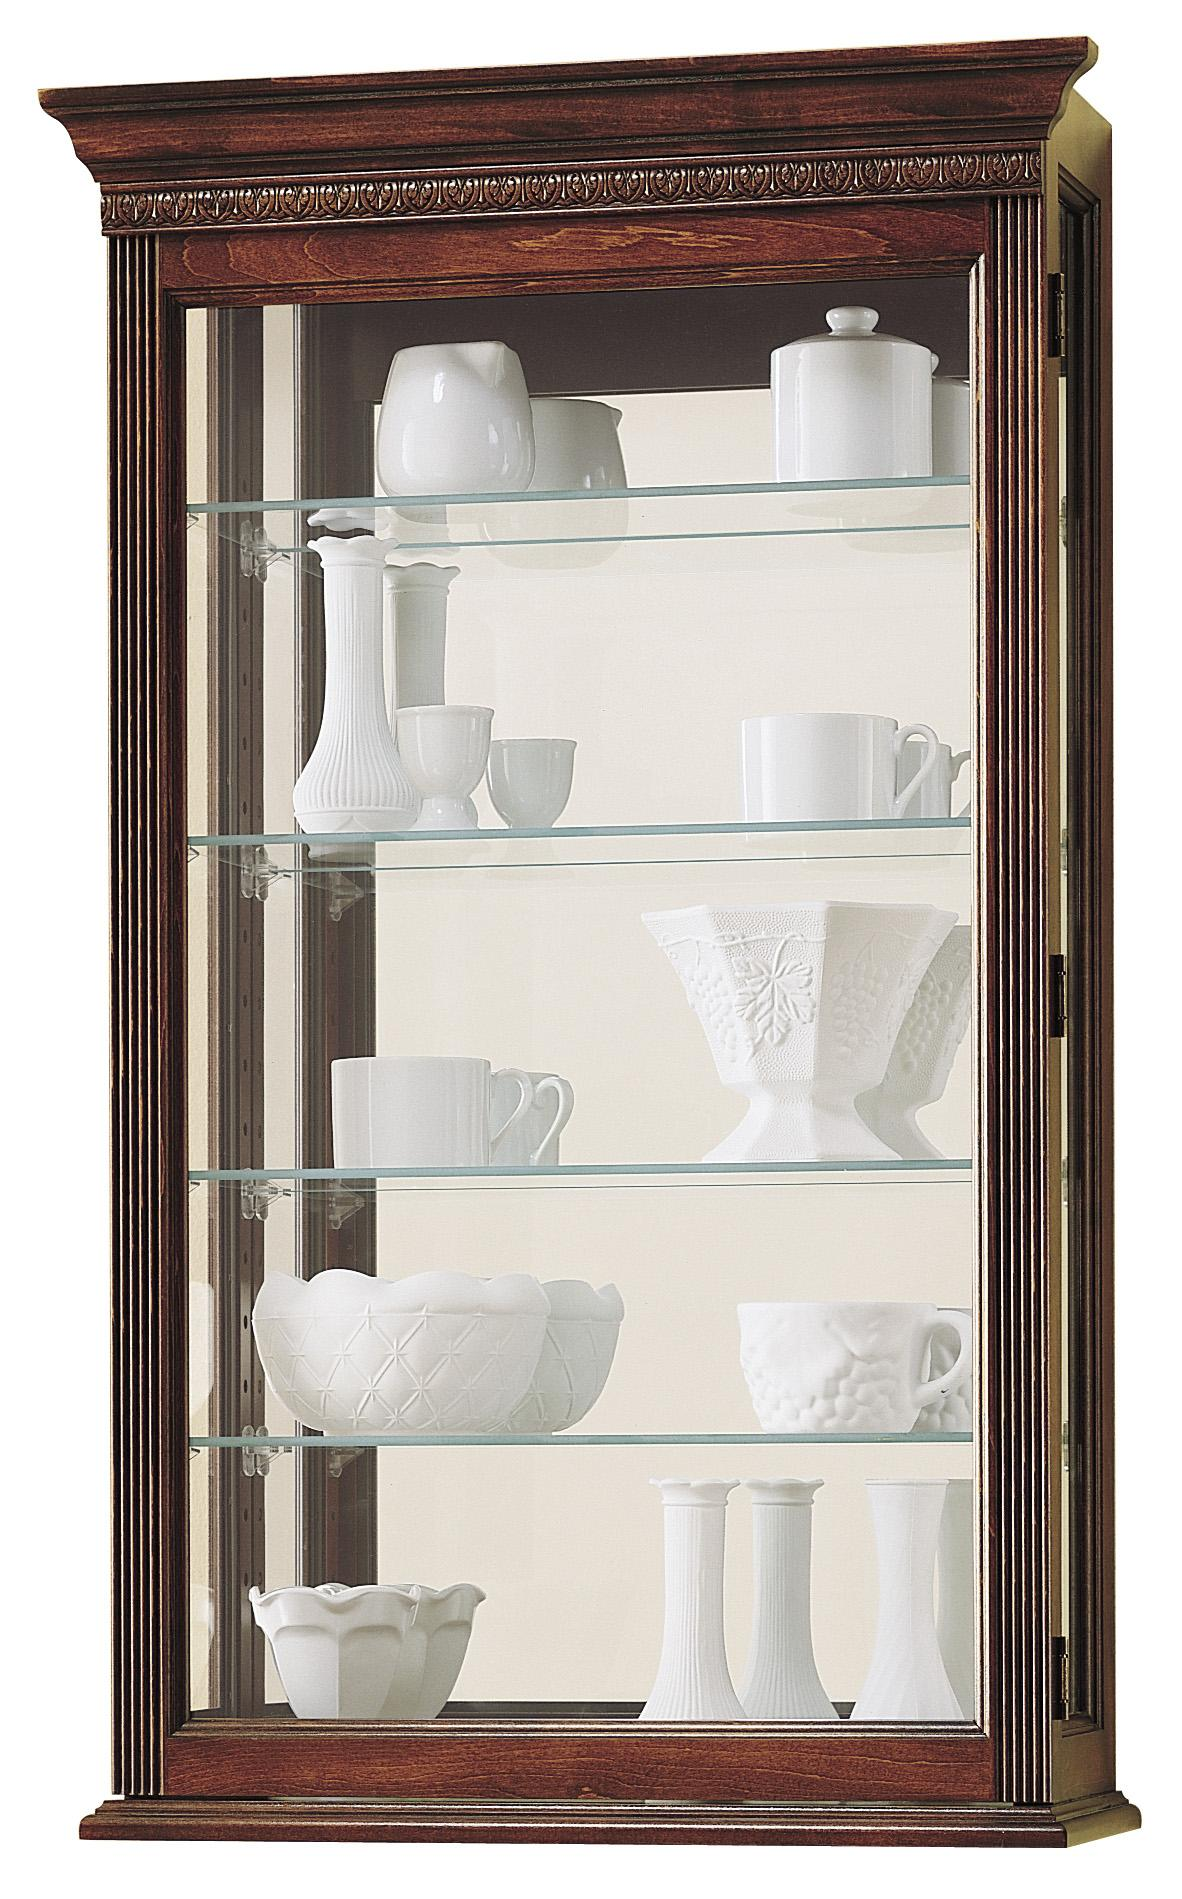 Howard Miller Wall Curios Edmonton Display Cabinet - Item Number: 685-104